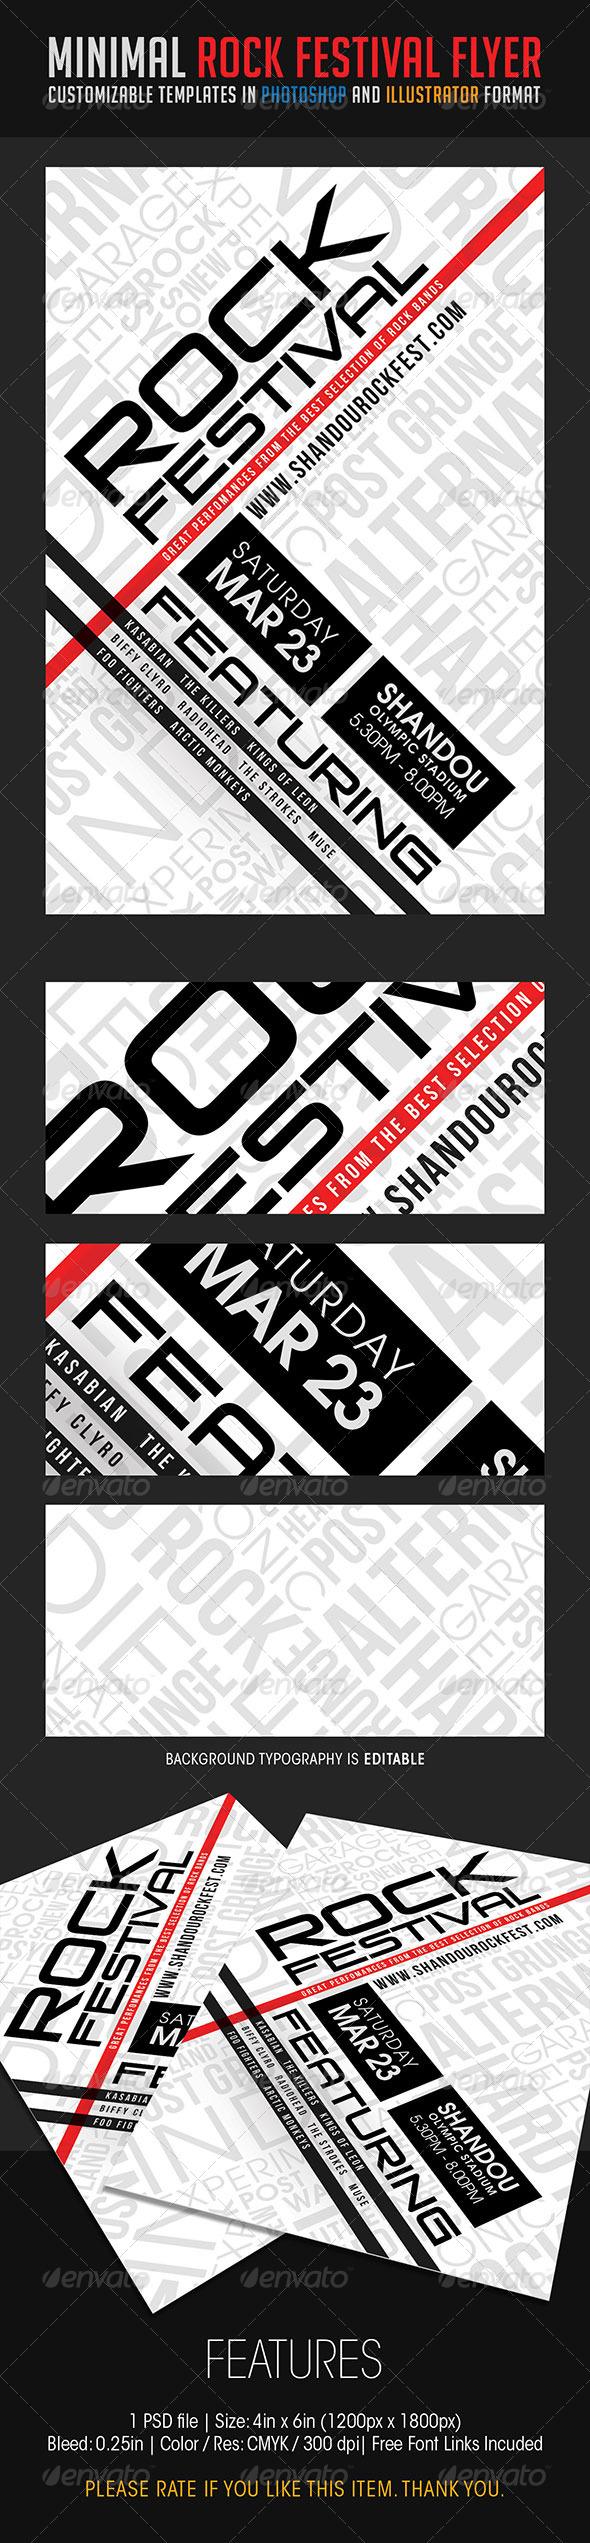 GraphicRiver Minimal Rock Festival Flyer 6726734